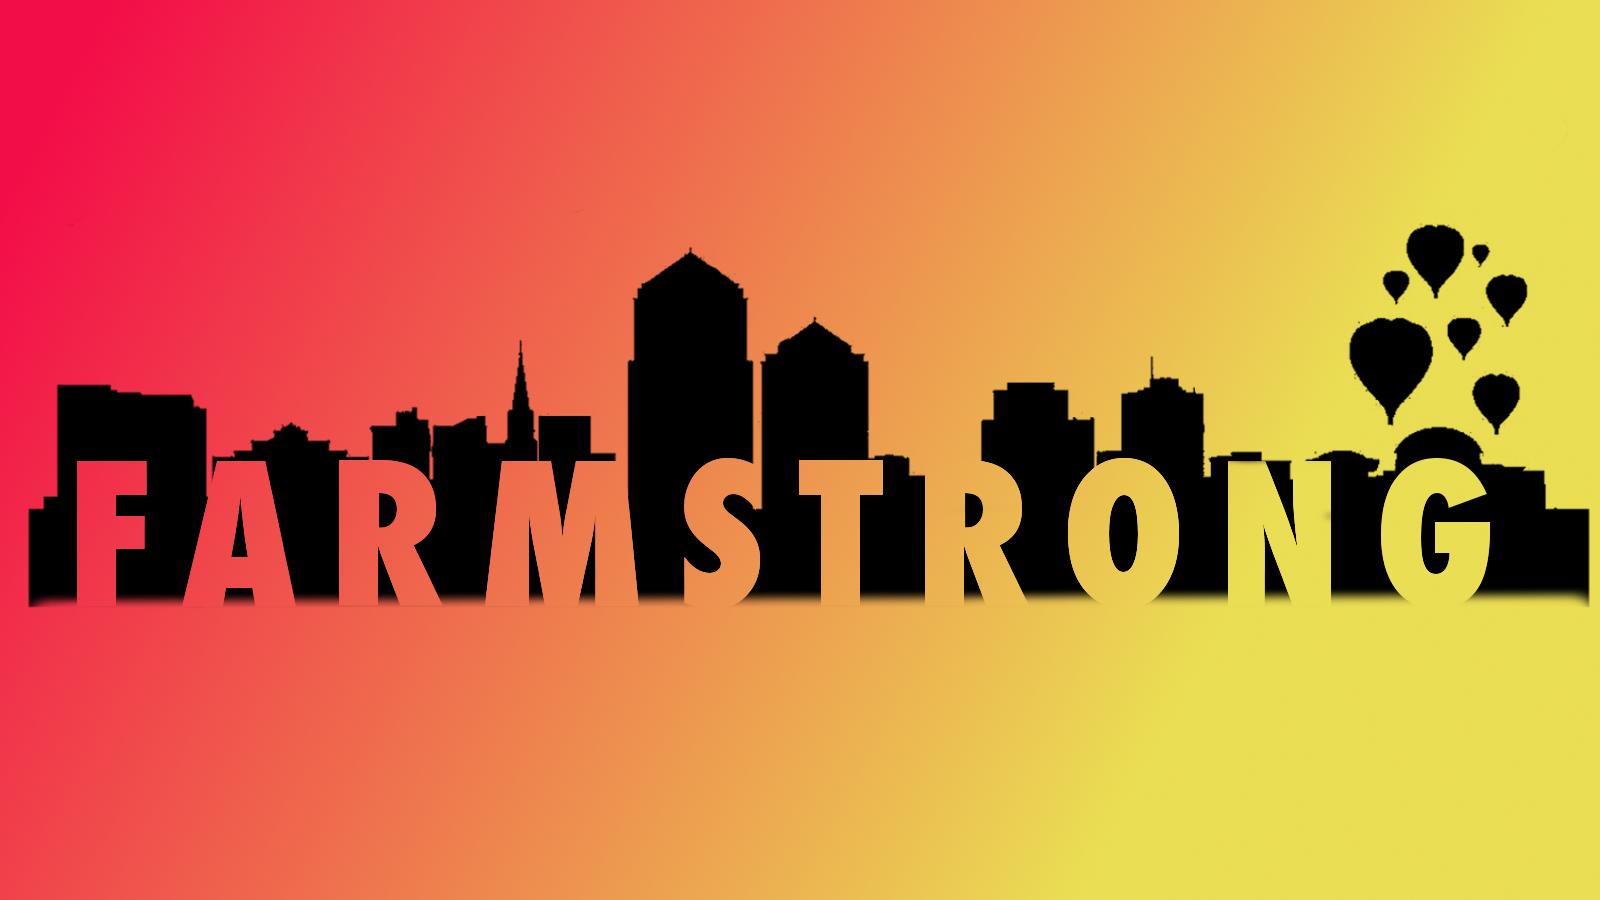 FarmStrong 2017: Fall Festival and 5k/10k Fun-Run!